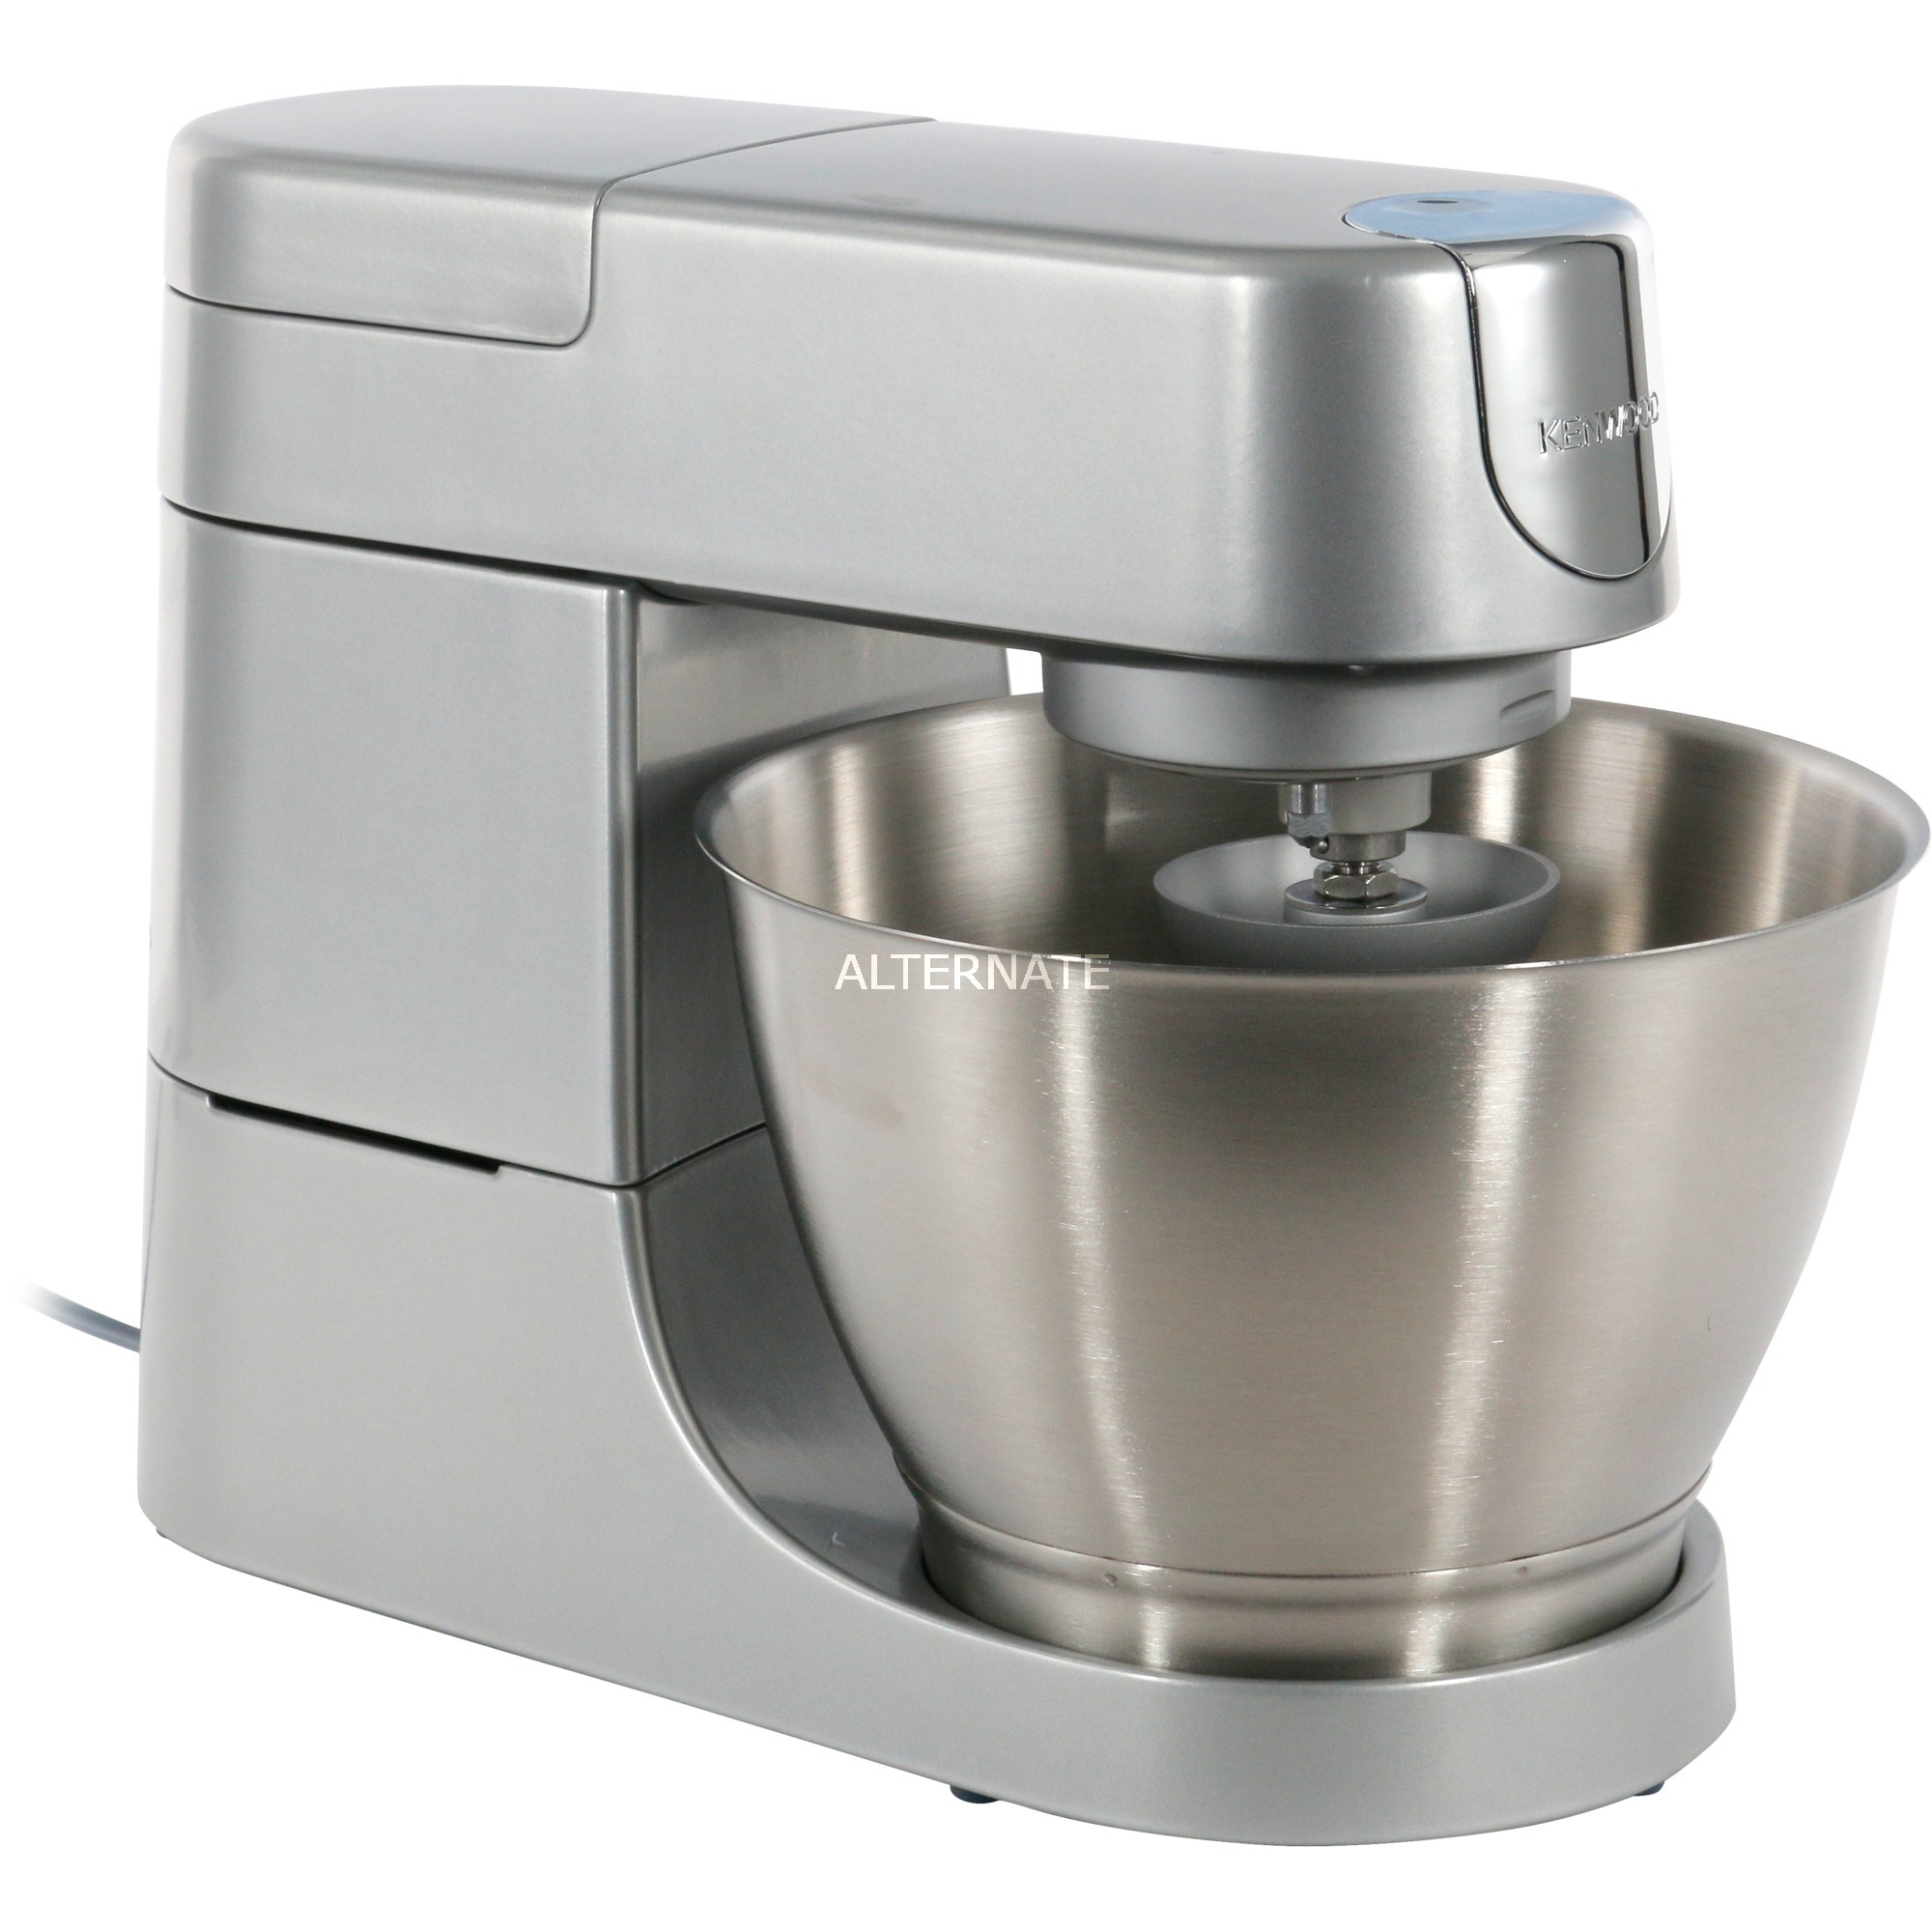 Kenwood Chef KVC3100S robot da cucina 4,6 L Argento 1000 W argento ...